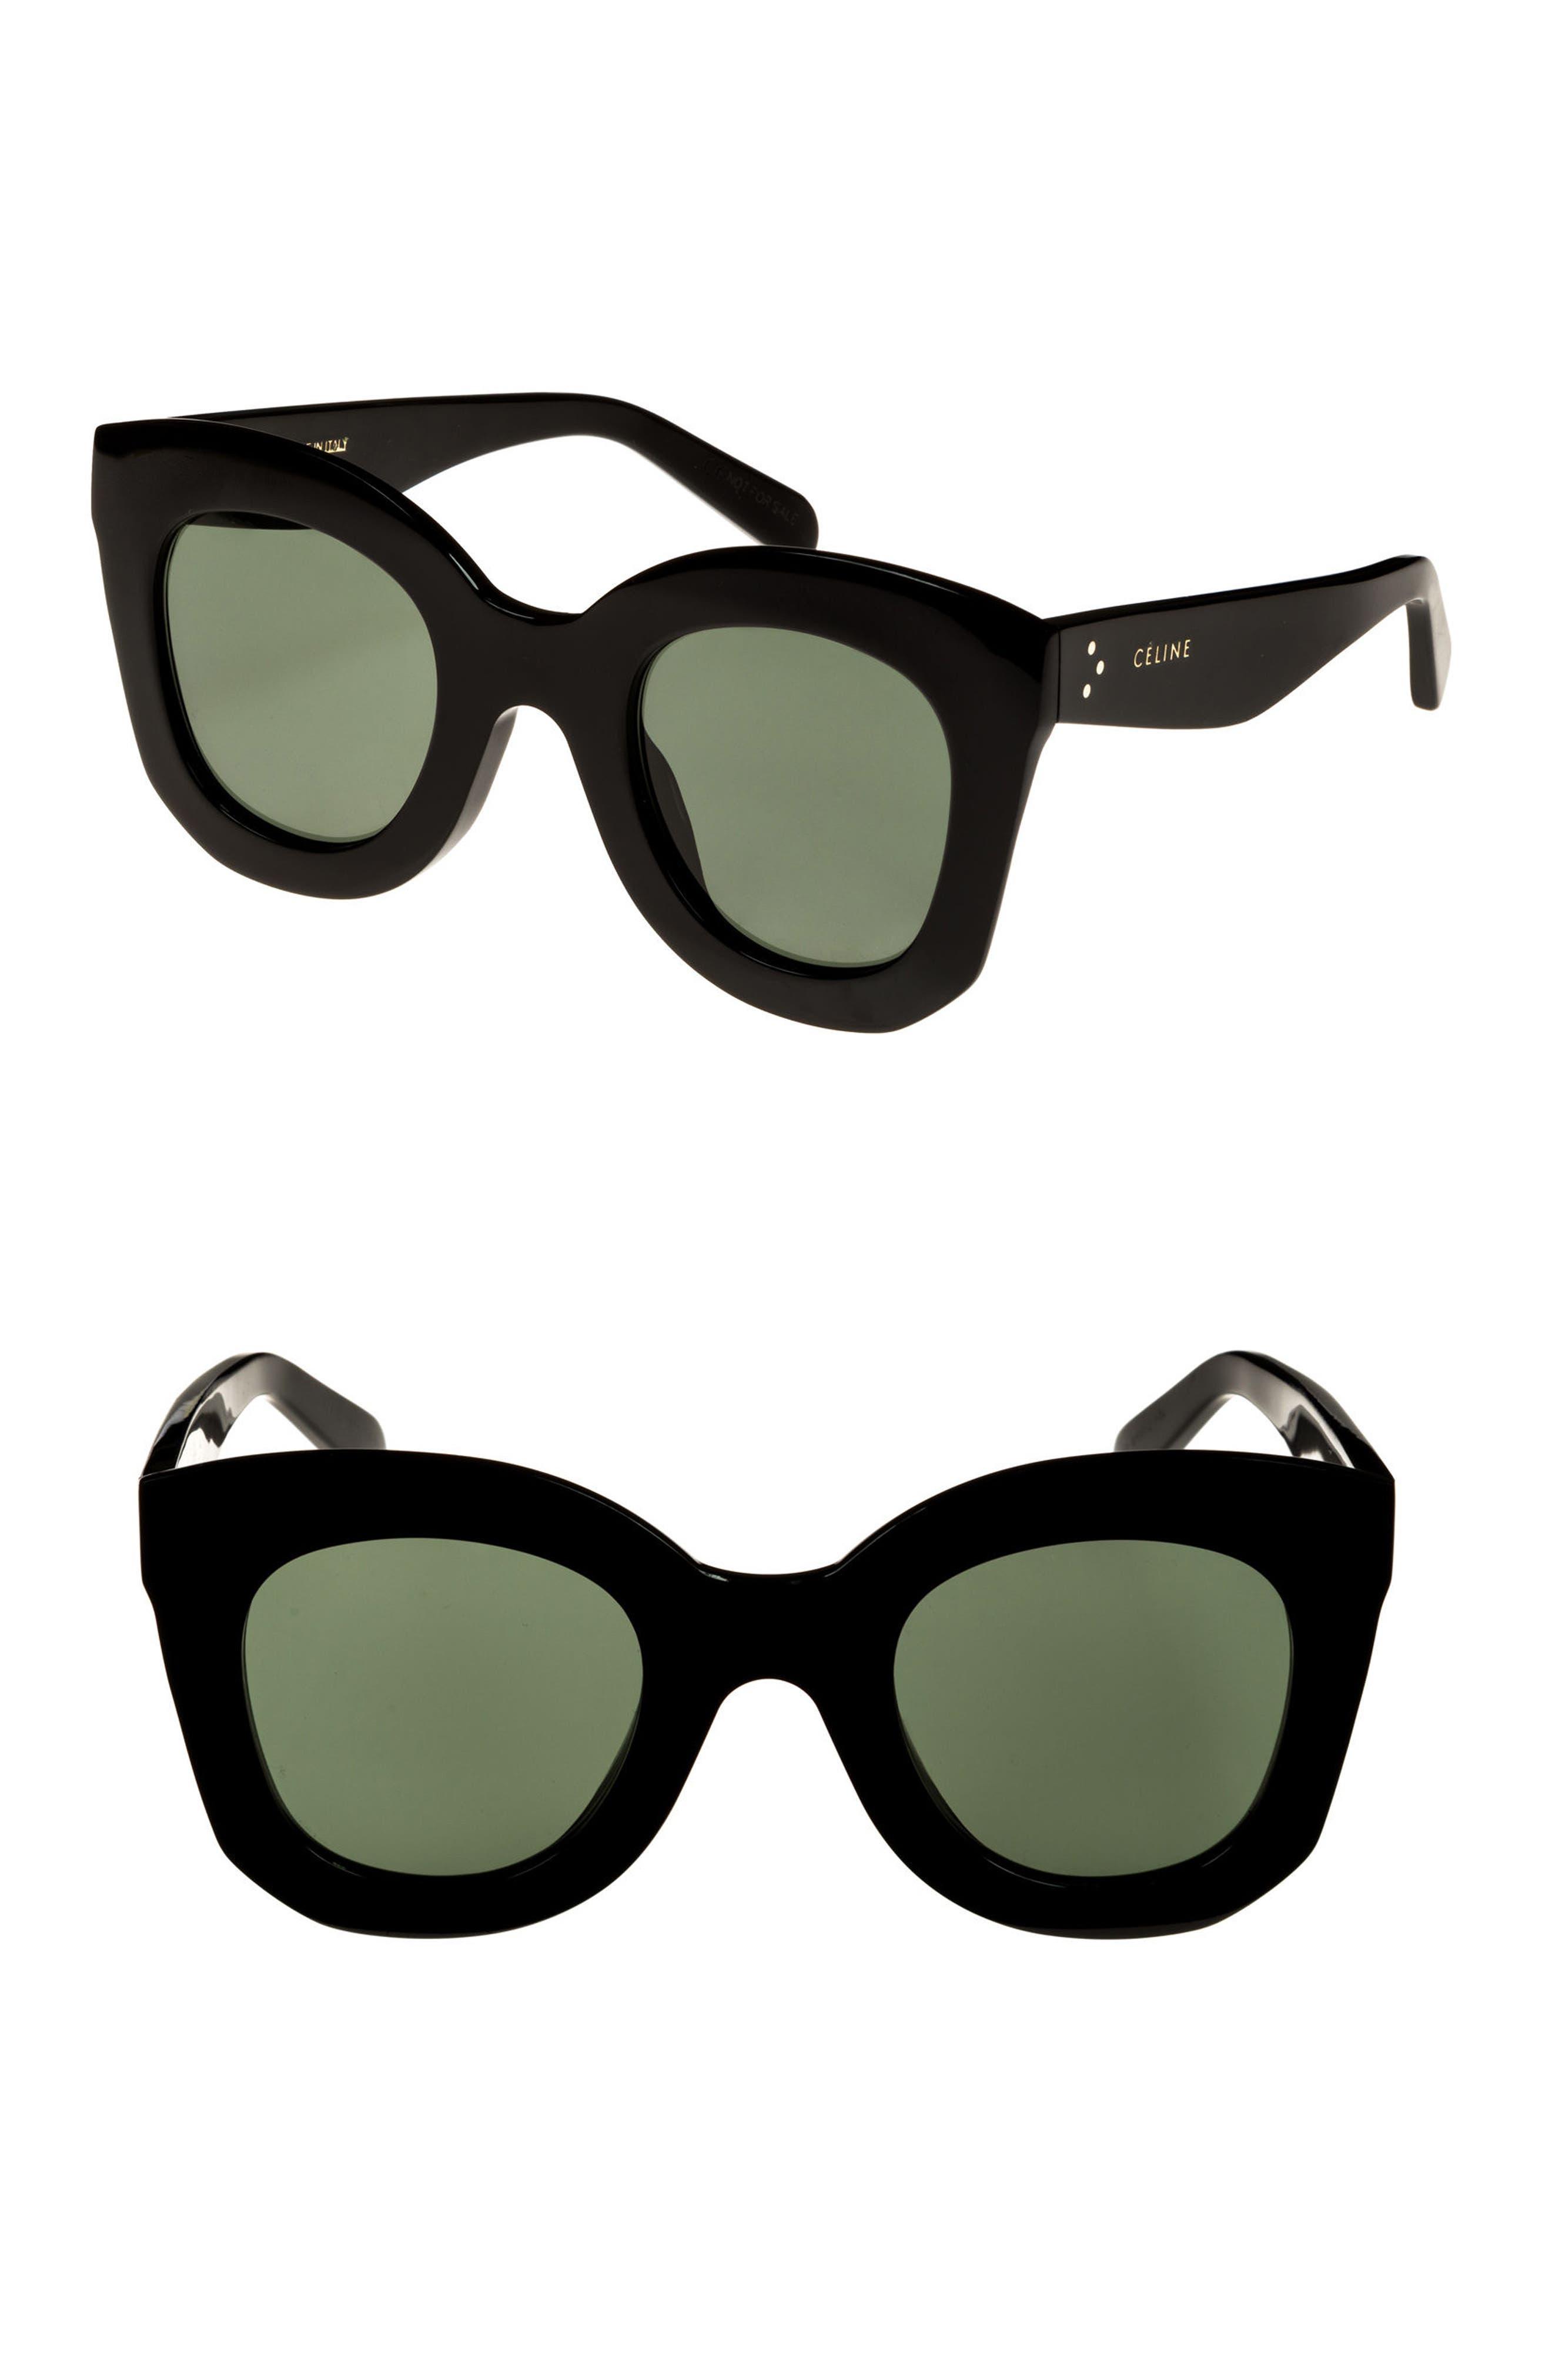 Cat Celine Eye Cat Women's Celine Eye Women's SunglassesNordstrom Women's Celine Cat SunglassesNordstrom dxoCBe